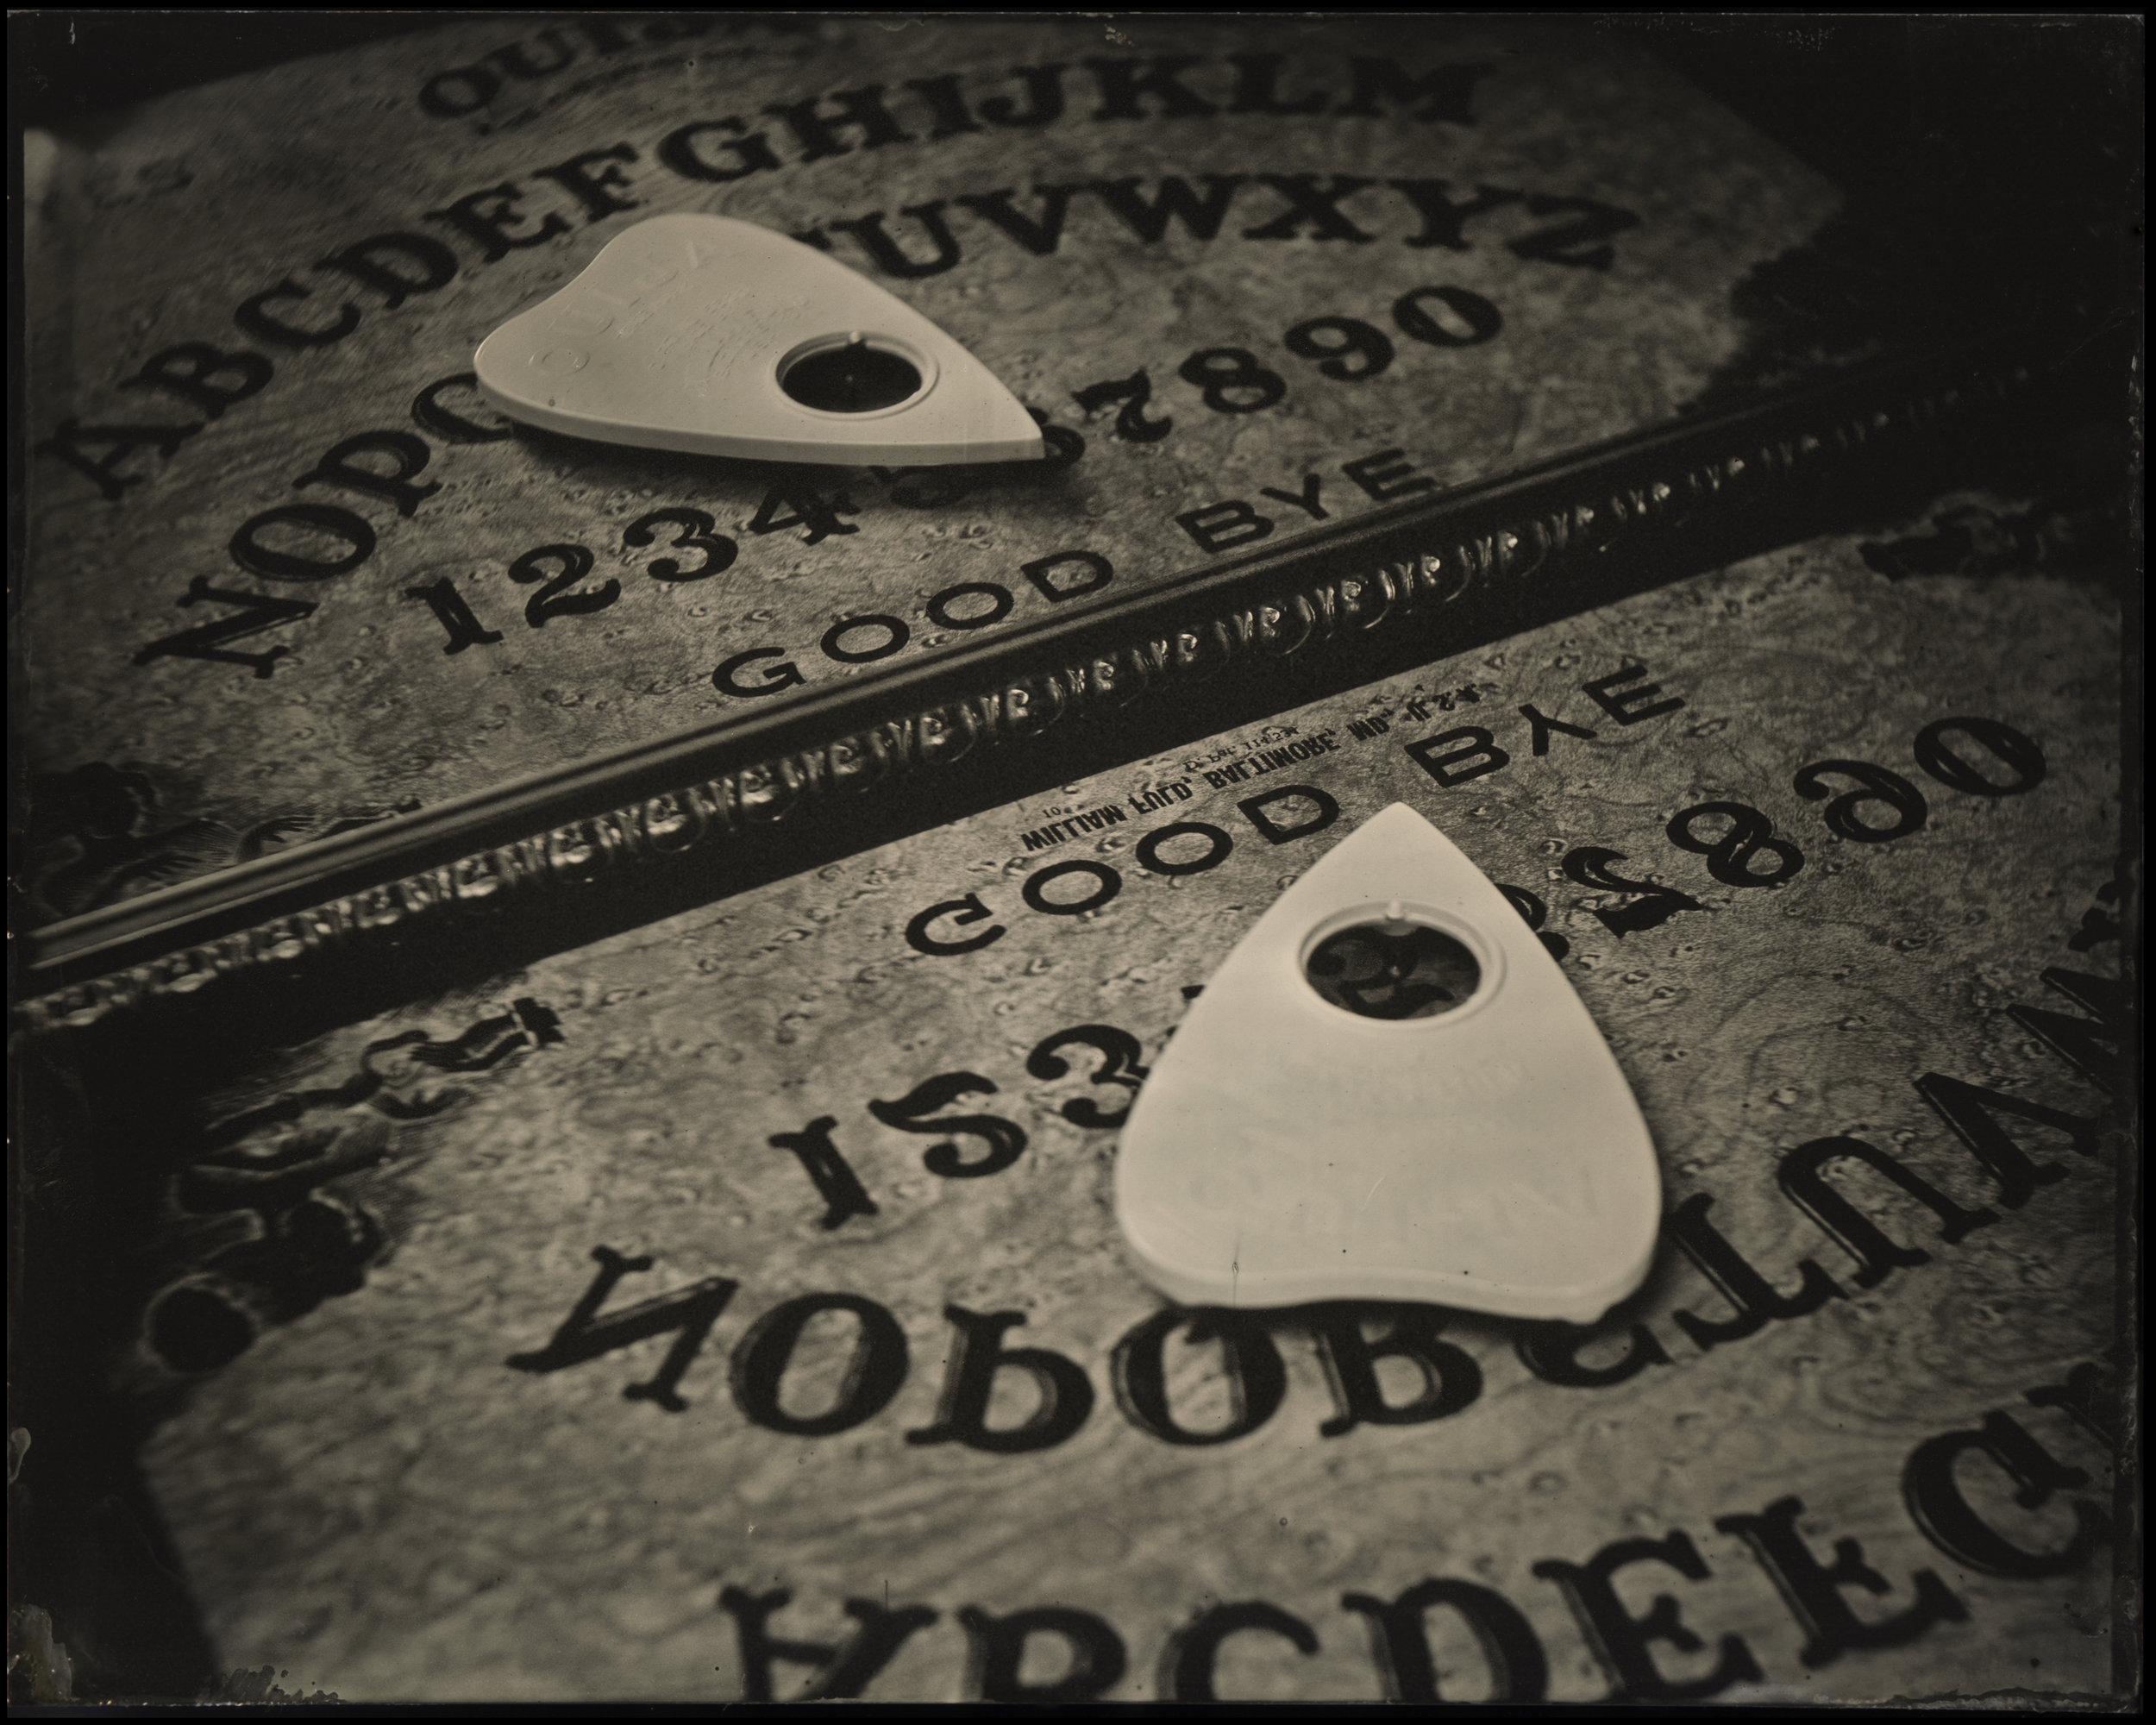 Ouija8x10.jpg